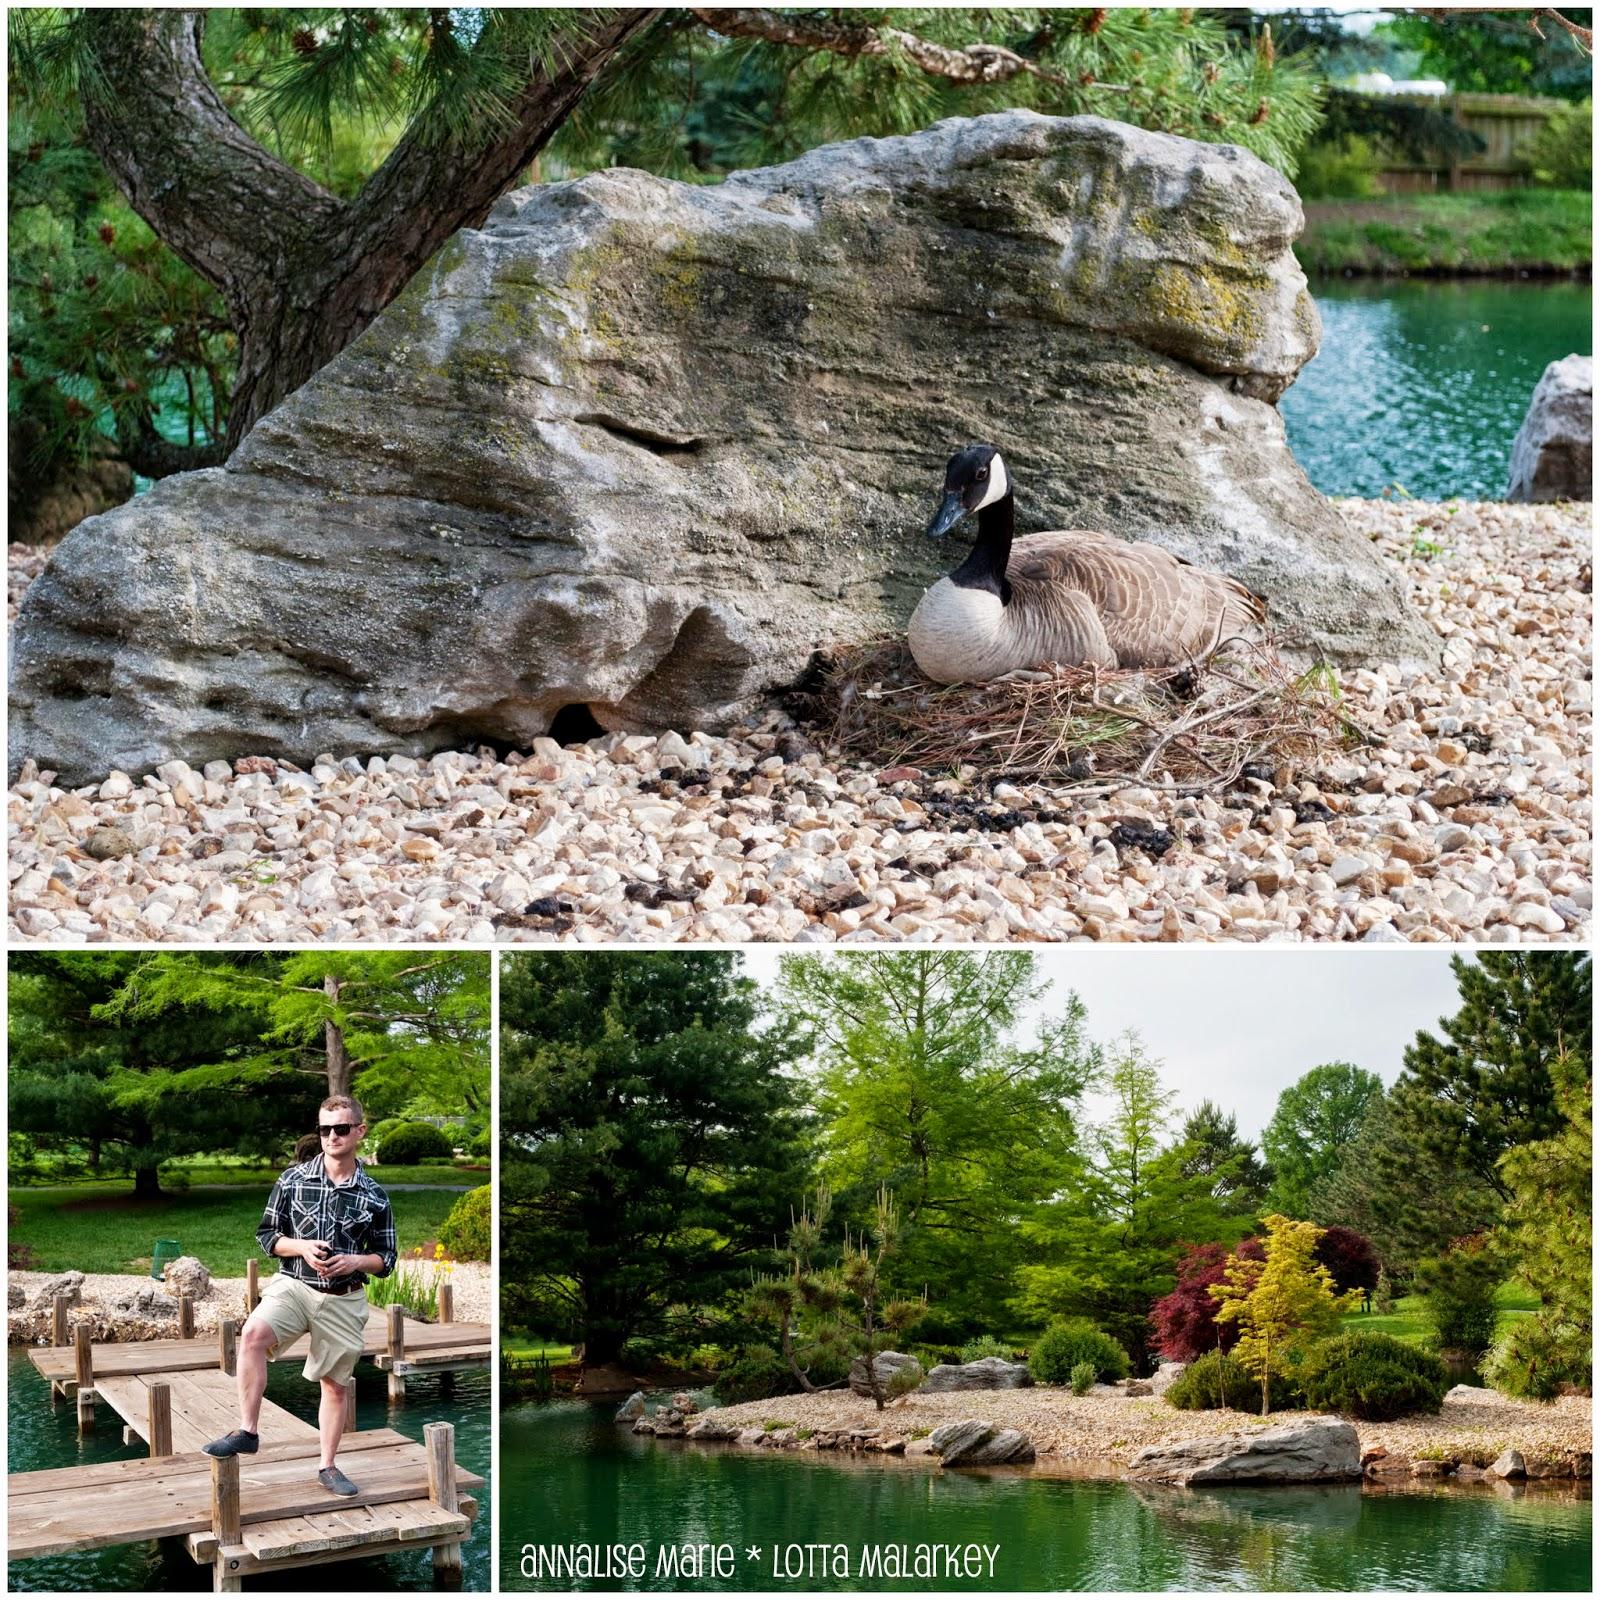 A Whole Lotta Malarkey And A Few Other Things Springfield Missouri Botanical Gardens